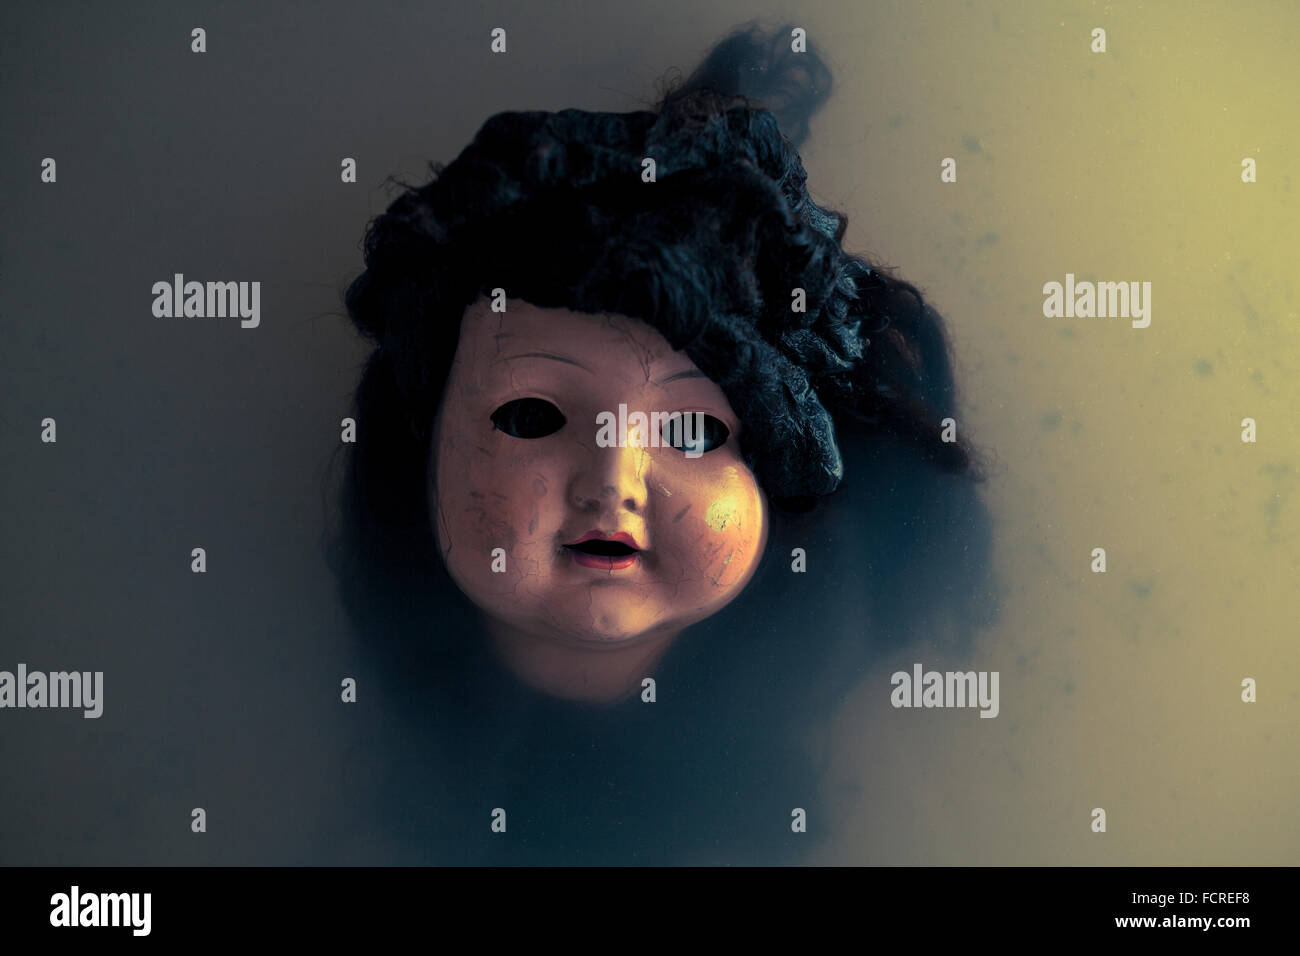 Gruselige Puppe Gesicht Stockbild